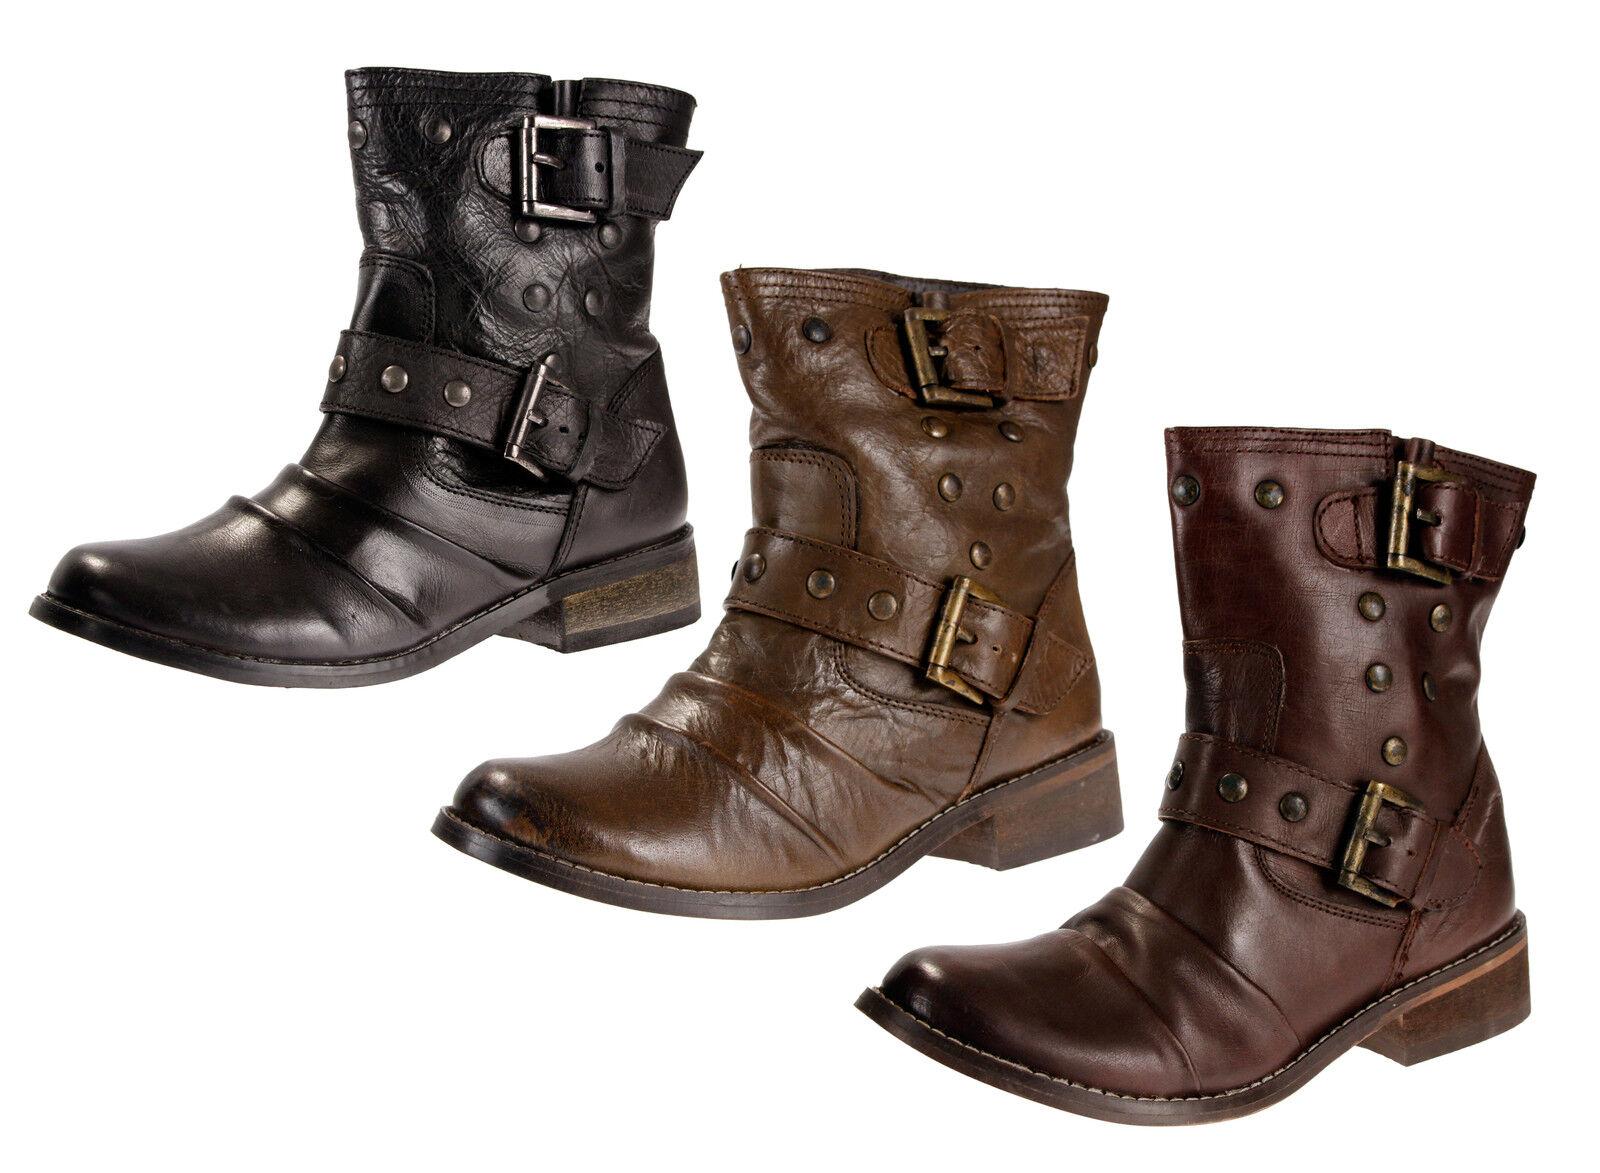 Mia XENIA Damenschuhe Ankle Moto Leder Studded Stiefel, 3 Farbes